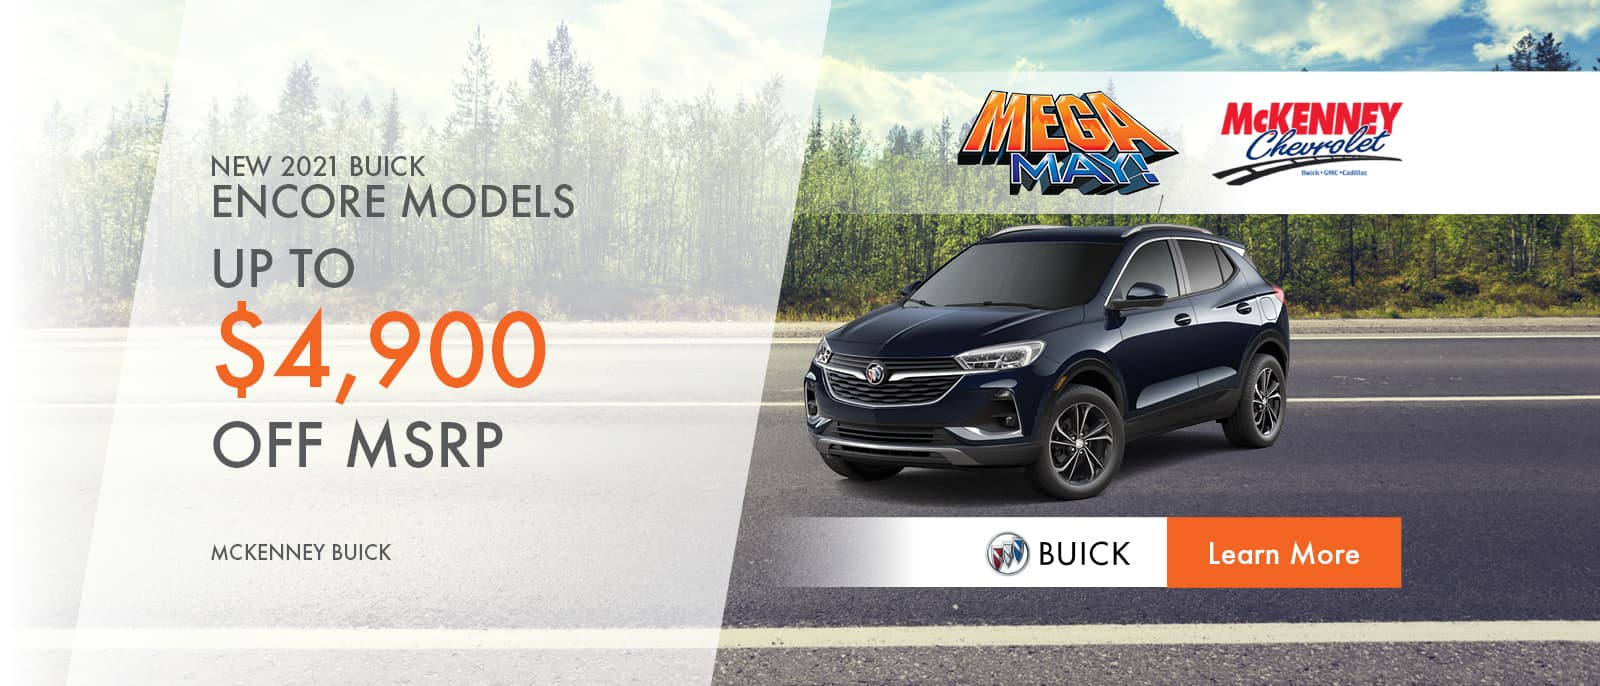 2021 Buick Encore Models